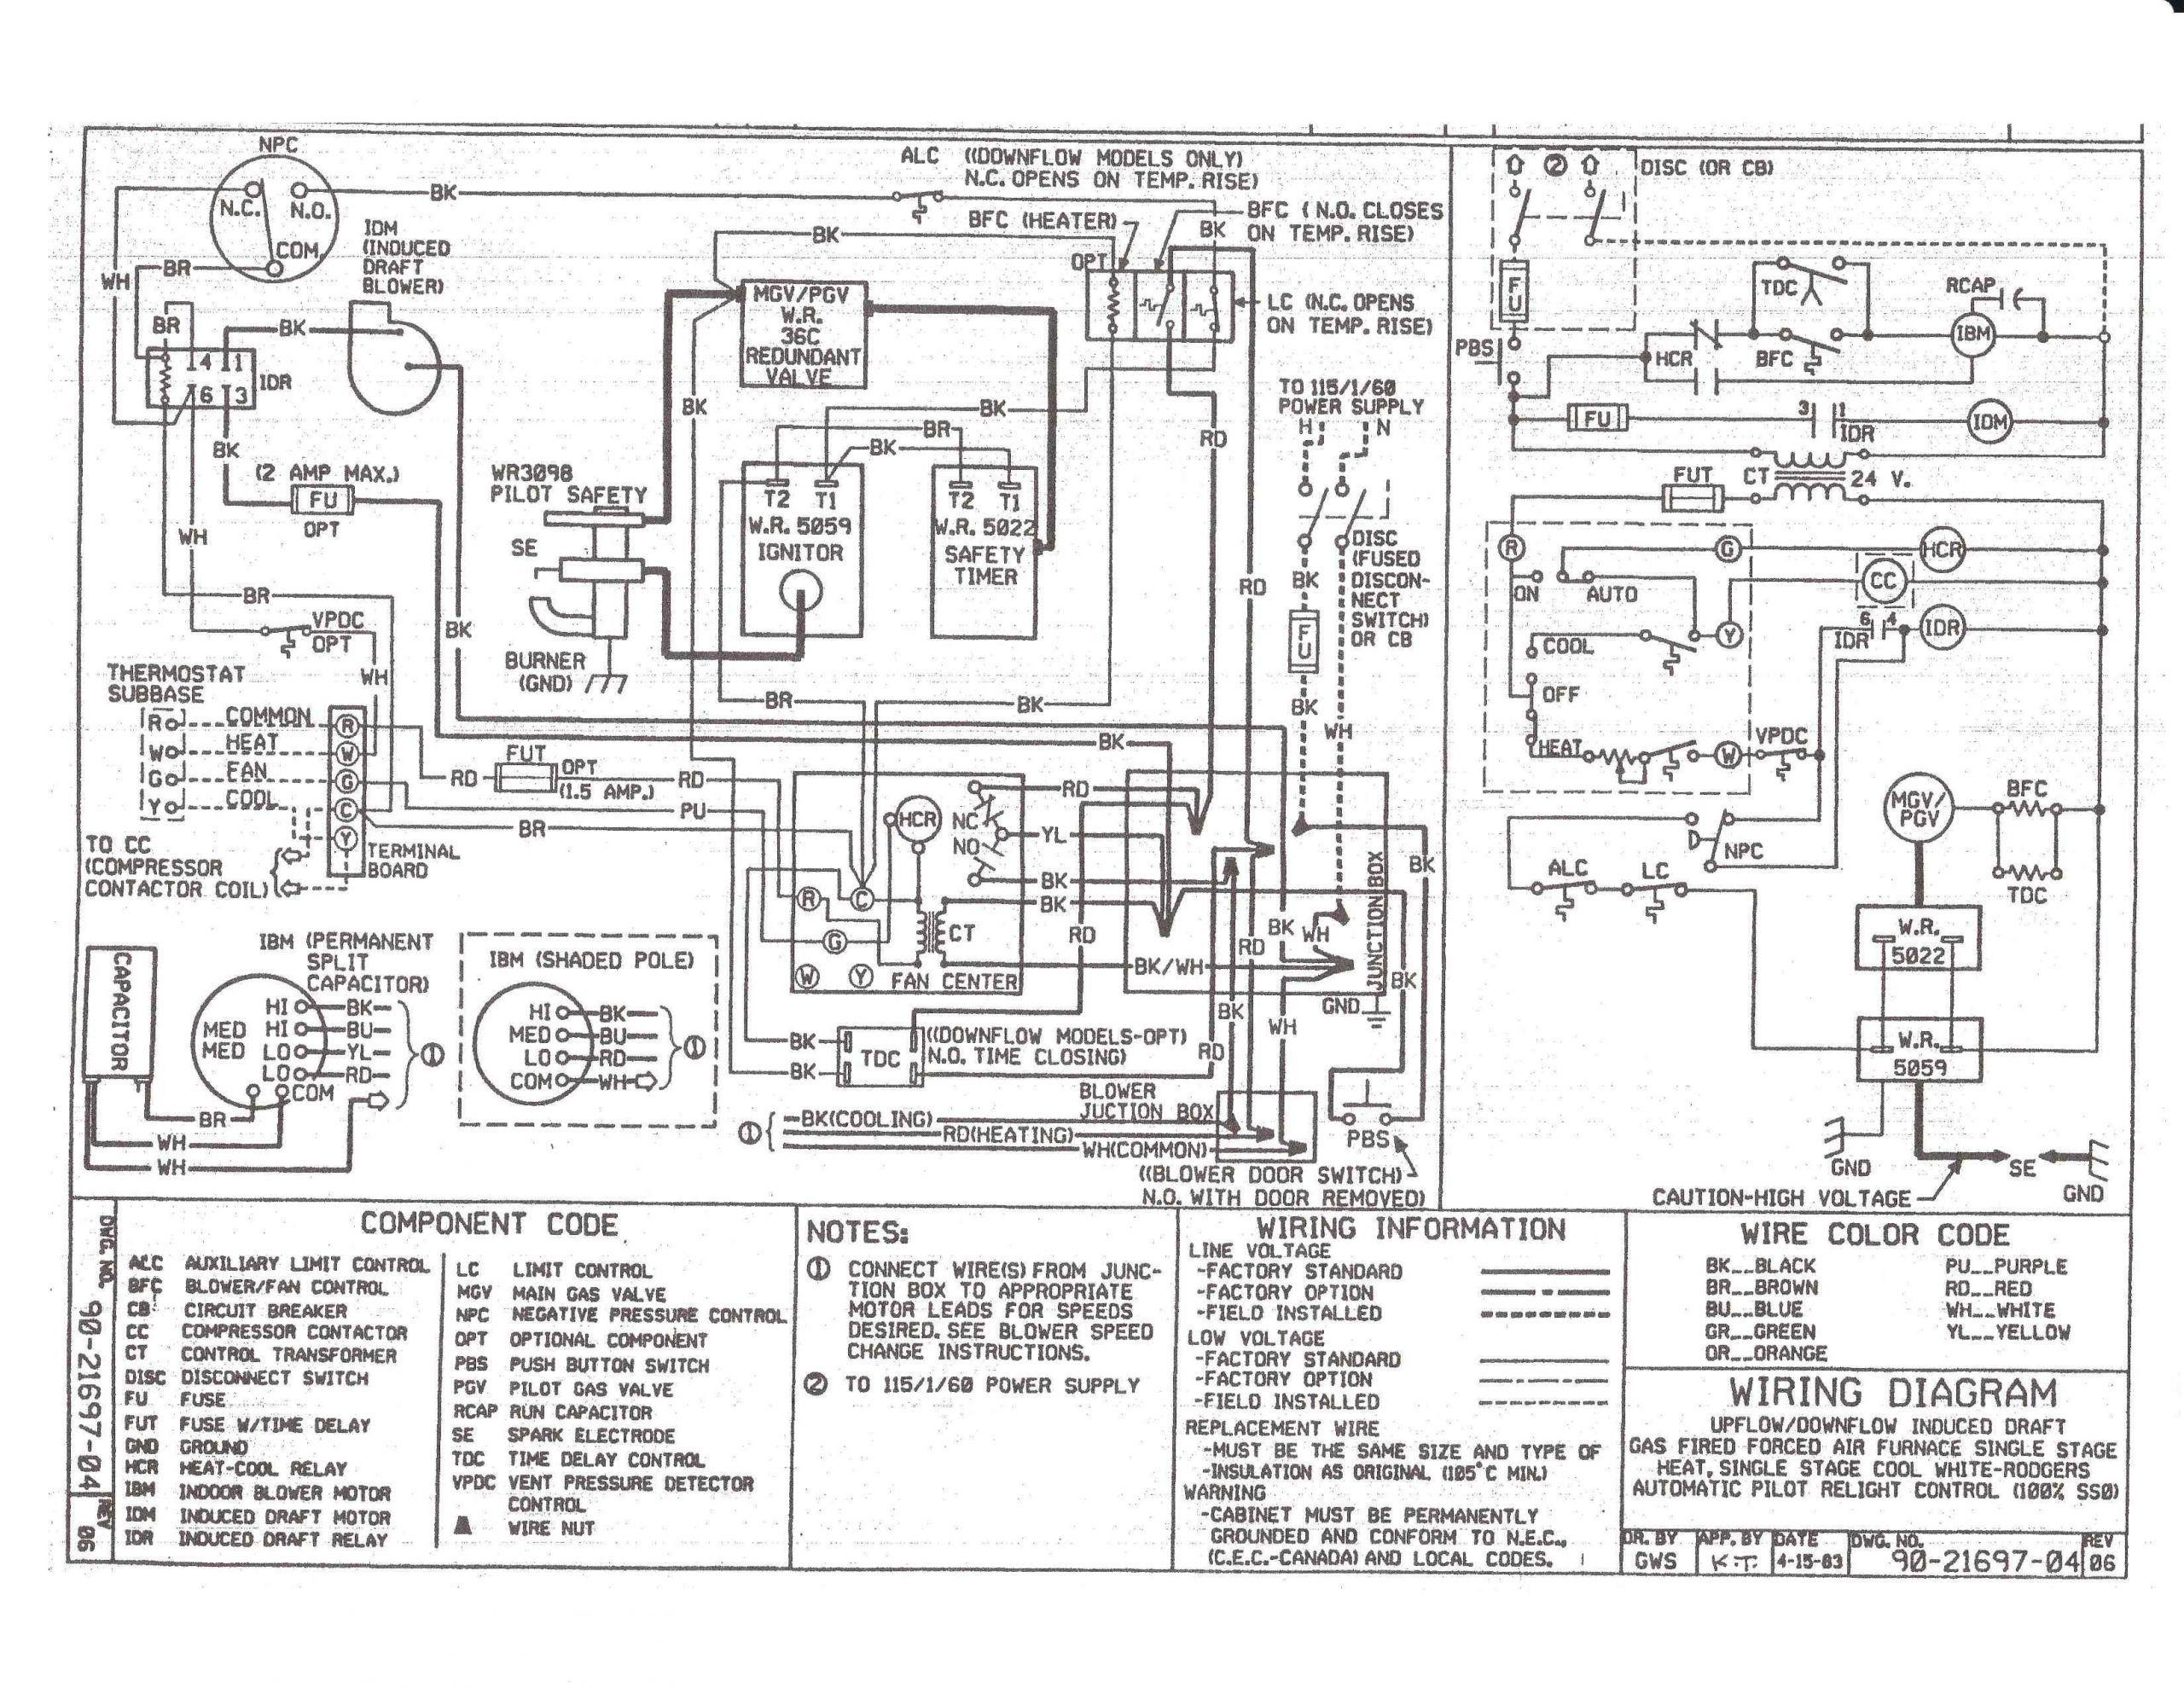 Details Here Https Dantuckerautos Com Luxury Isuzu Trooper Parts Catalogue Electrical Wiring Diagram Electric Furnace Thermostat Wiring